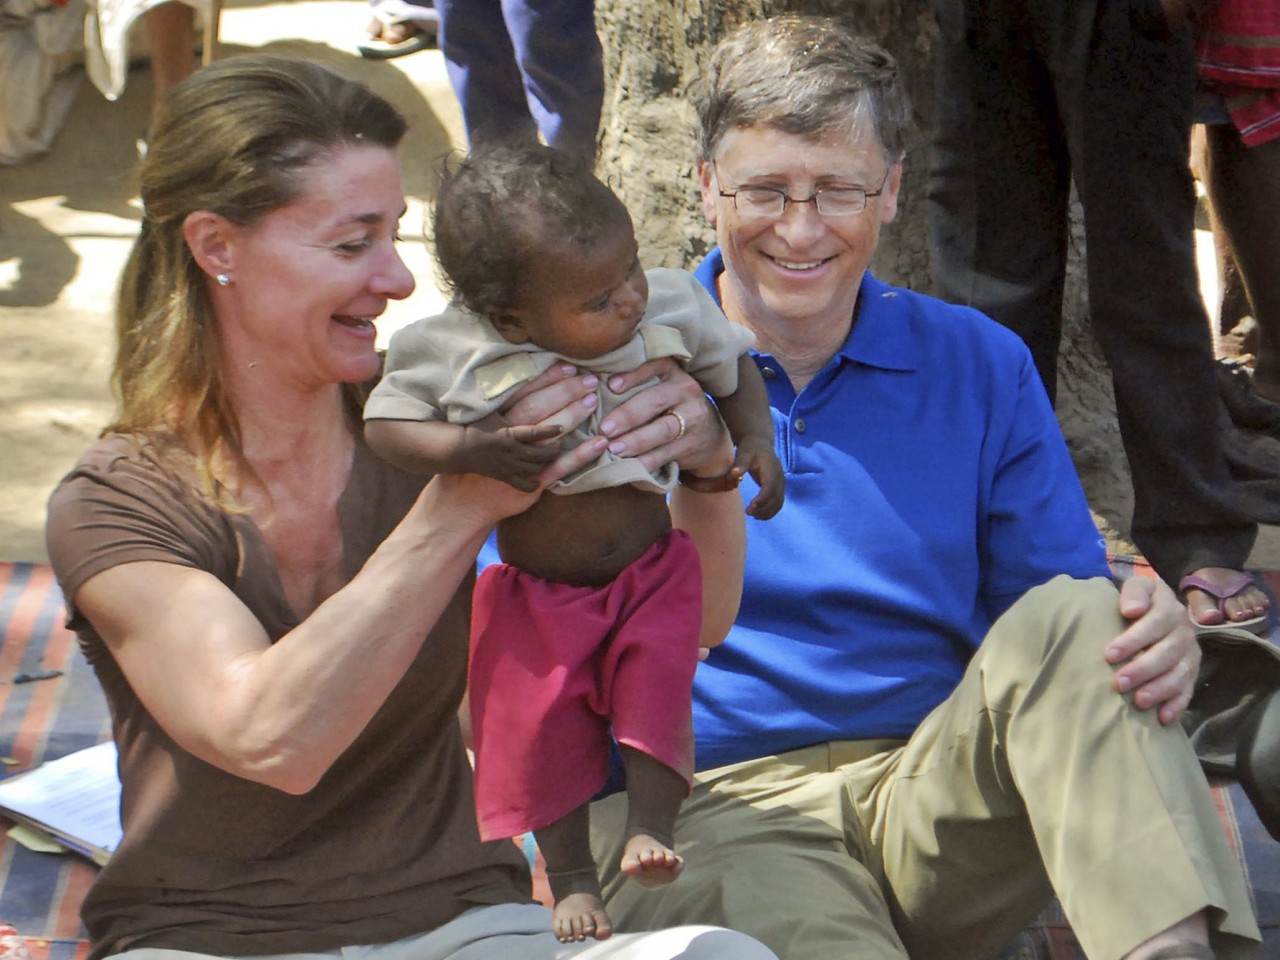 Bill Melinda Gates Foundation: Bill Gates As A Philanthropist: The Technologist Changing